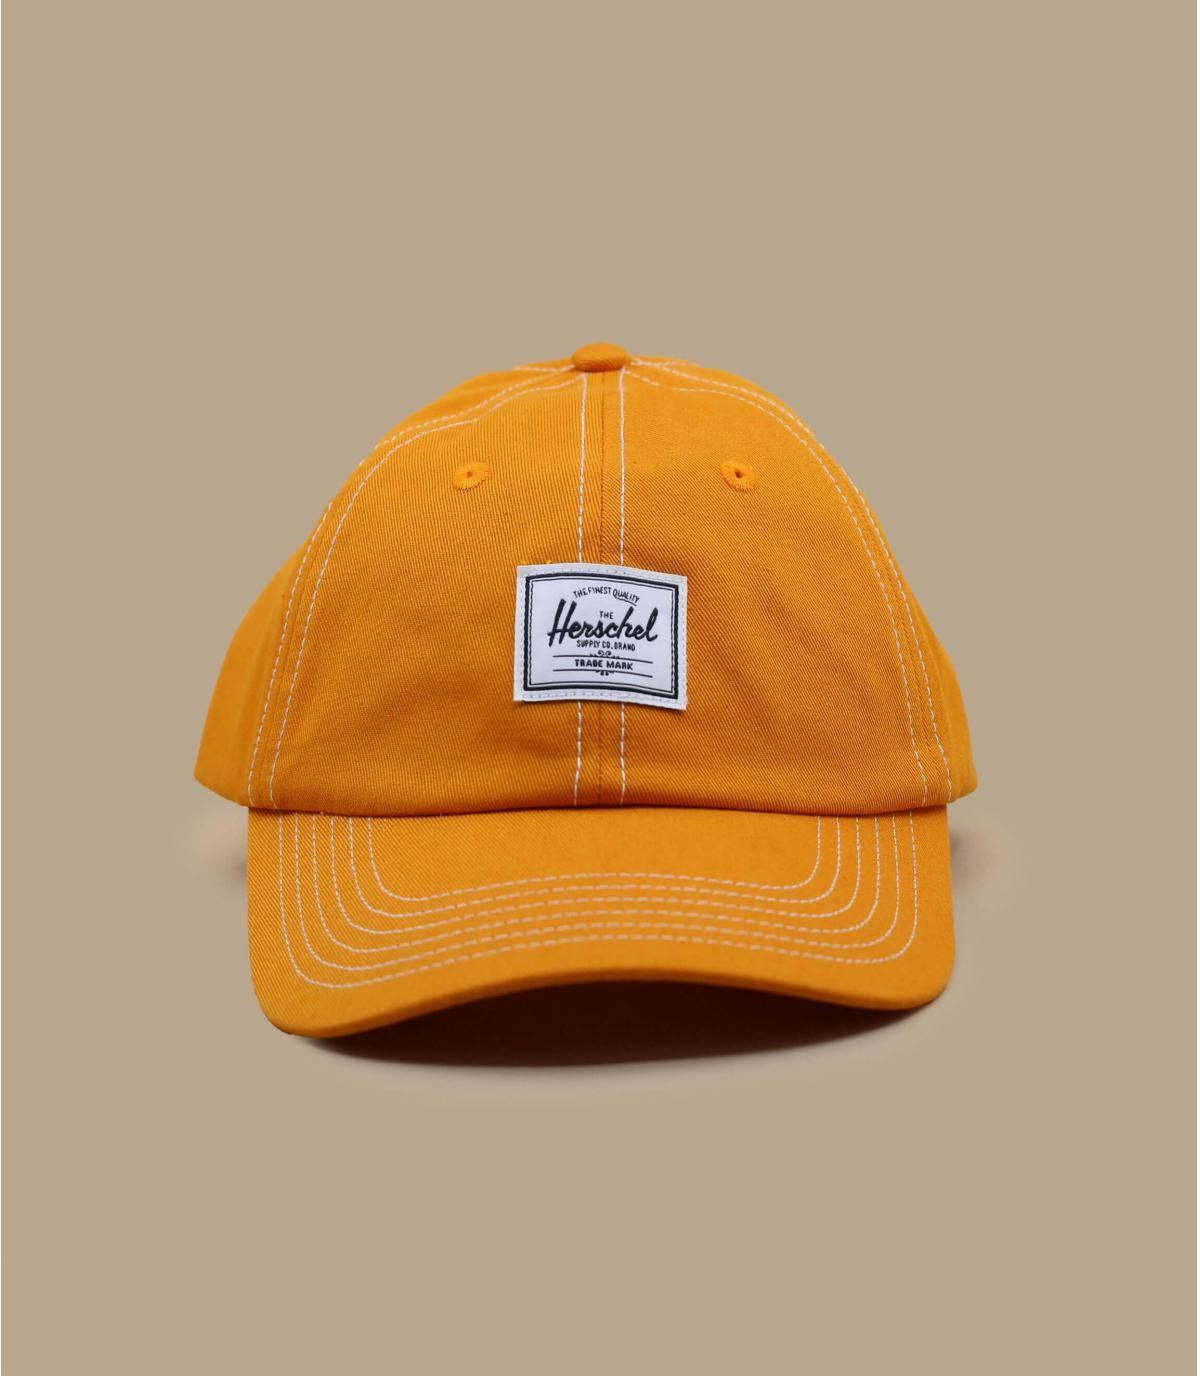 casquette Herschel jaune